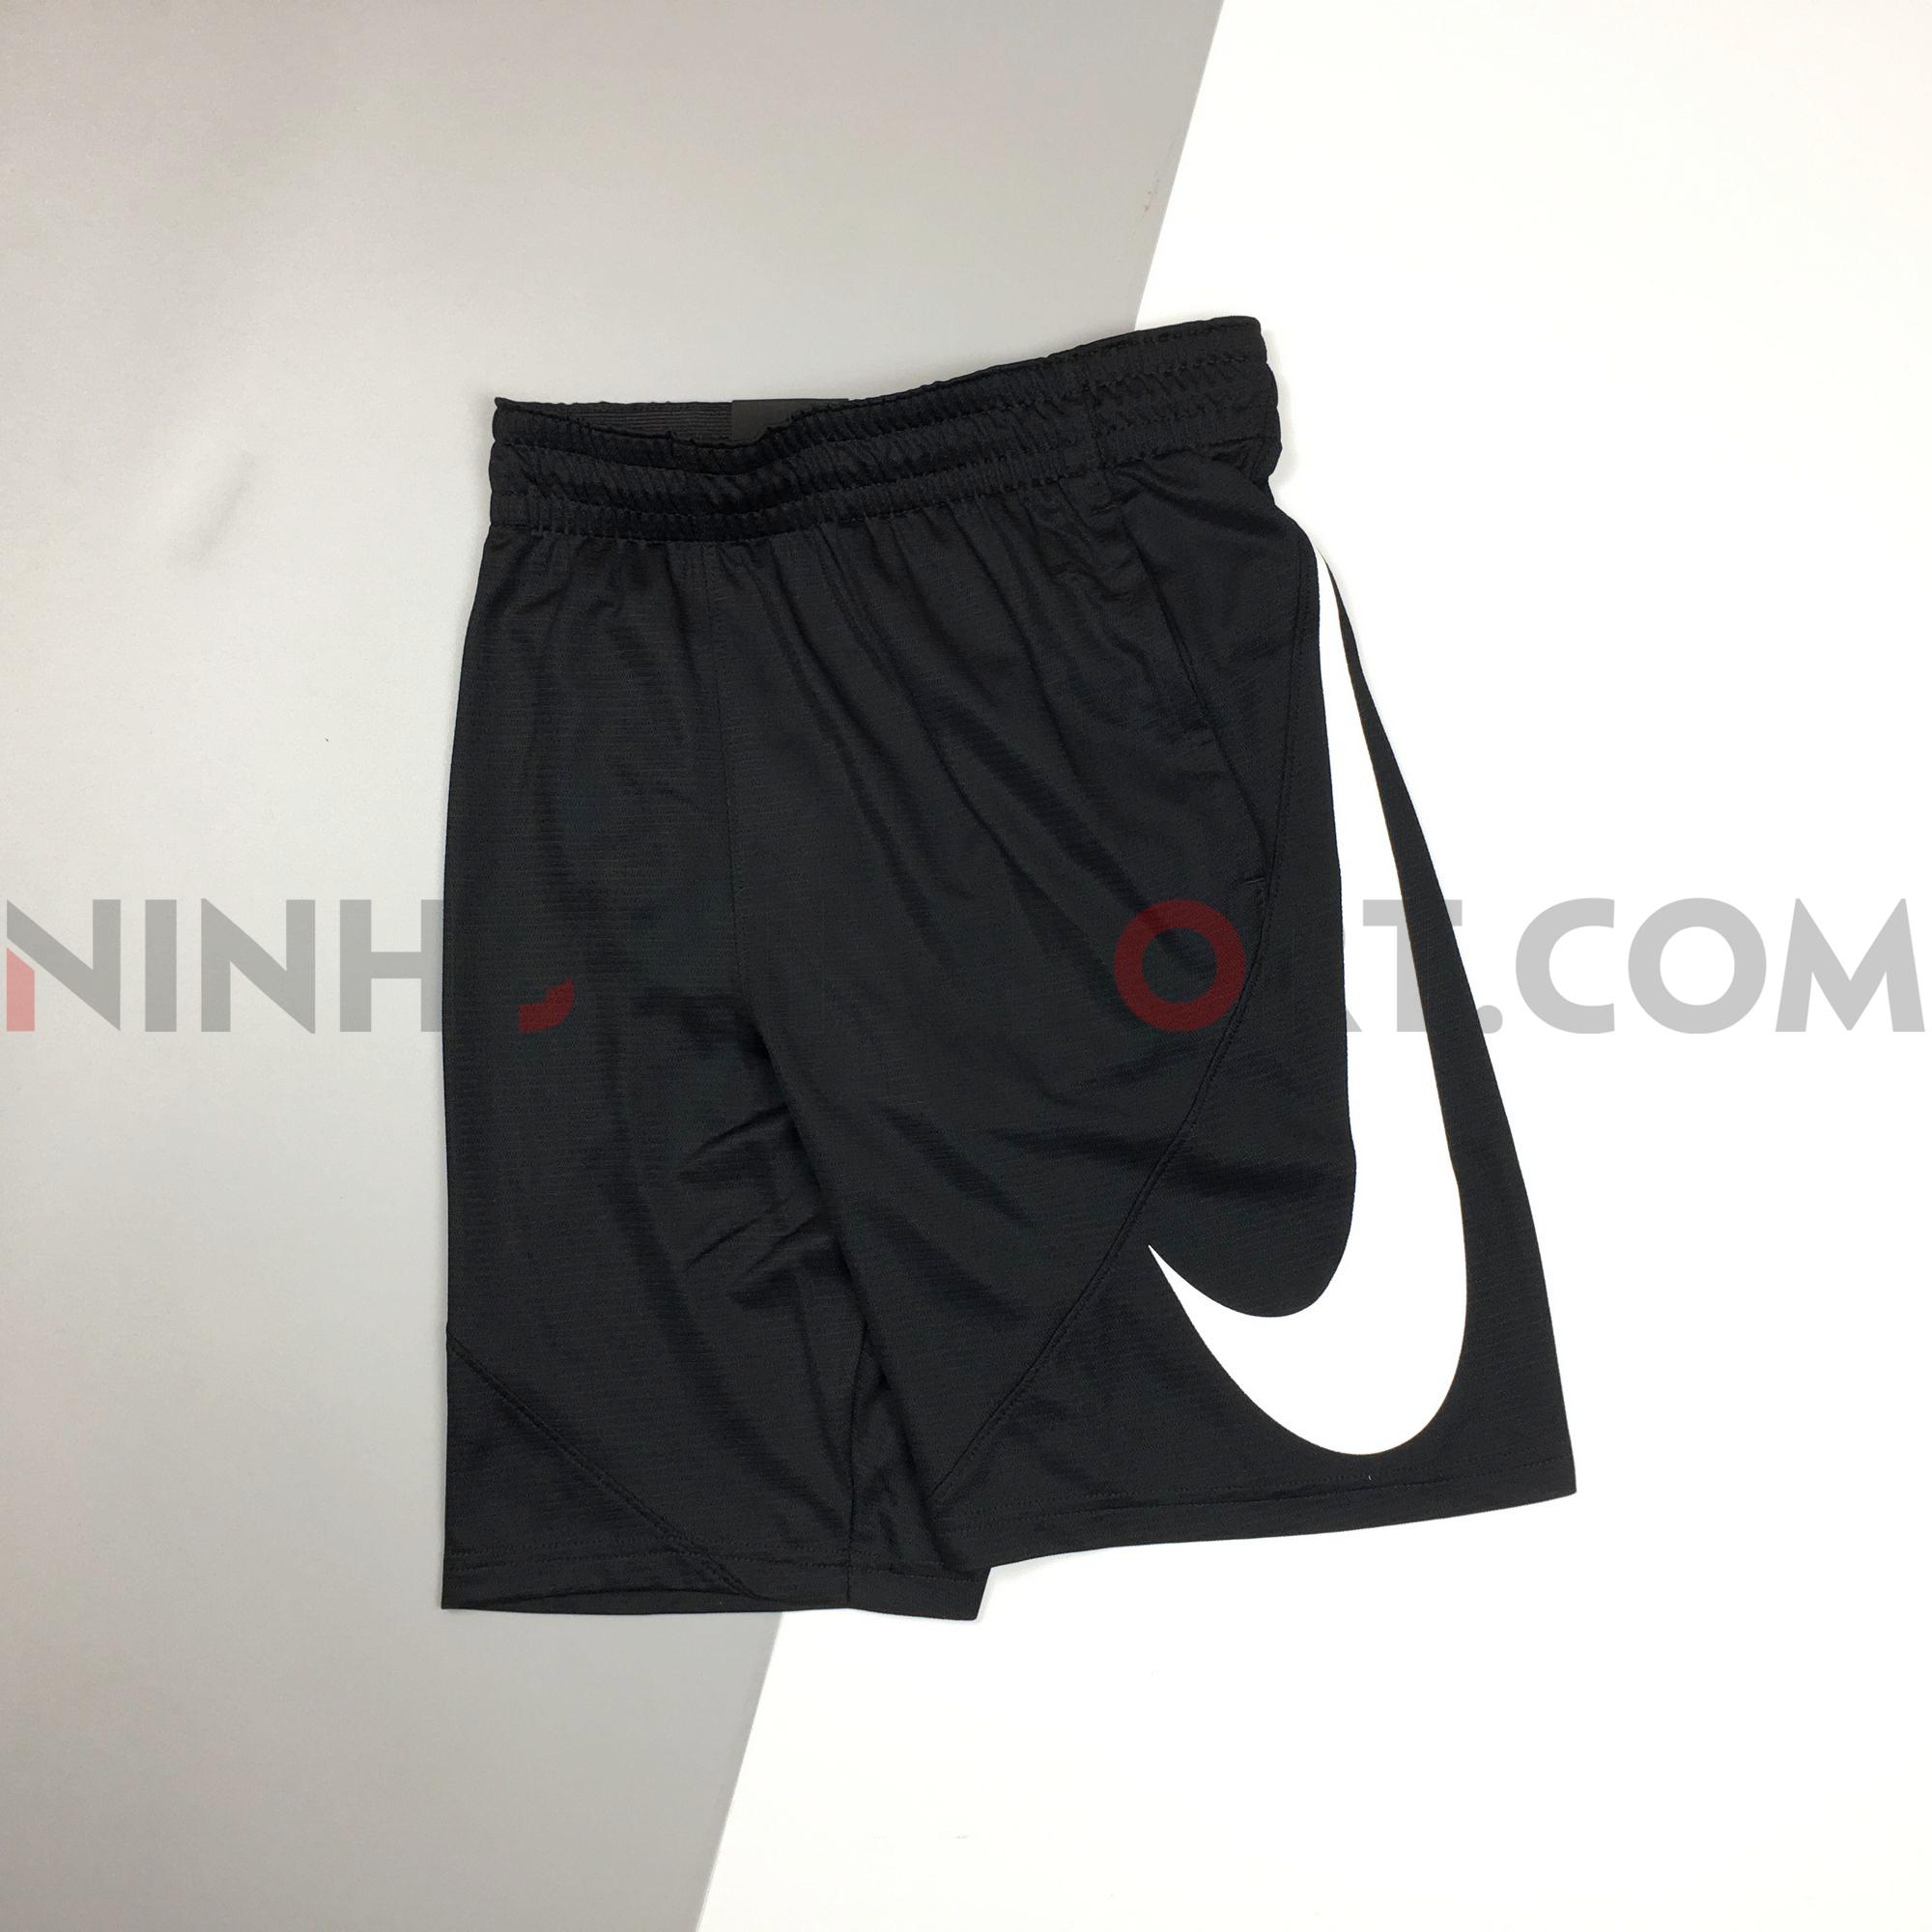 Quần thể thao nam Nike Basketball Short HBR 910706-010